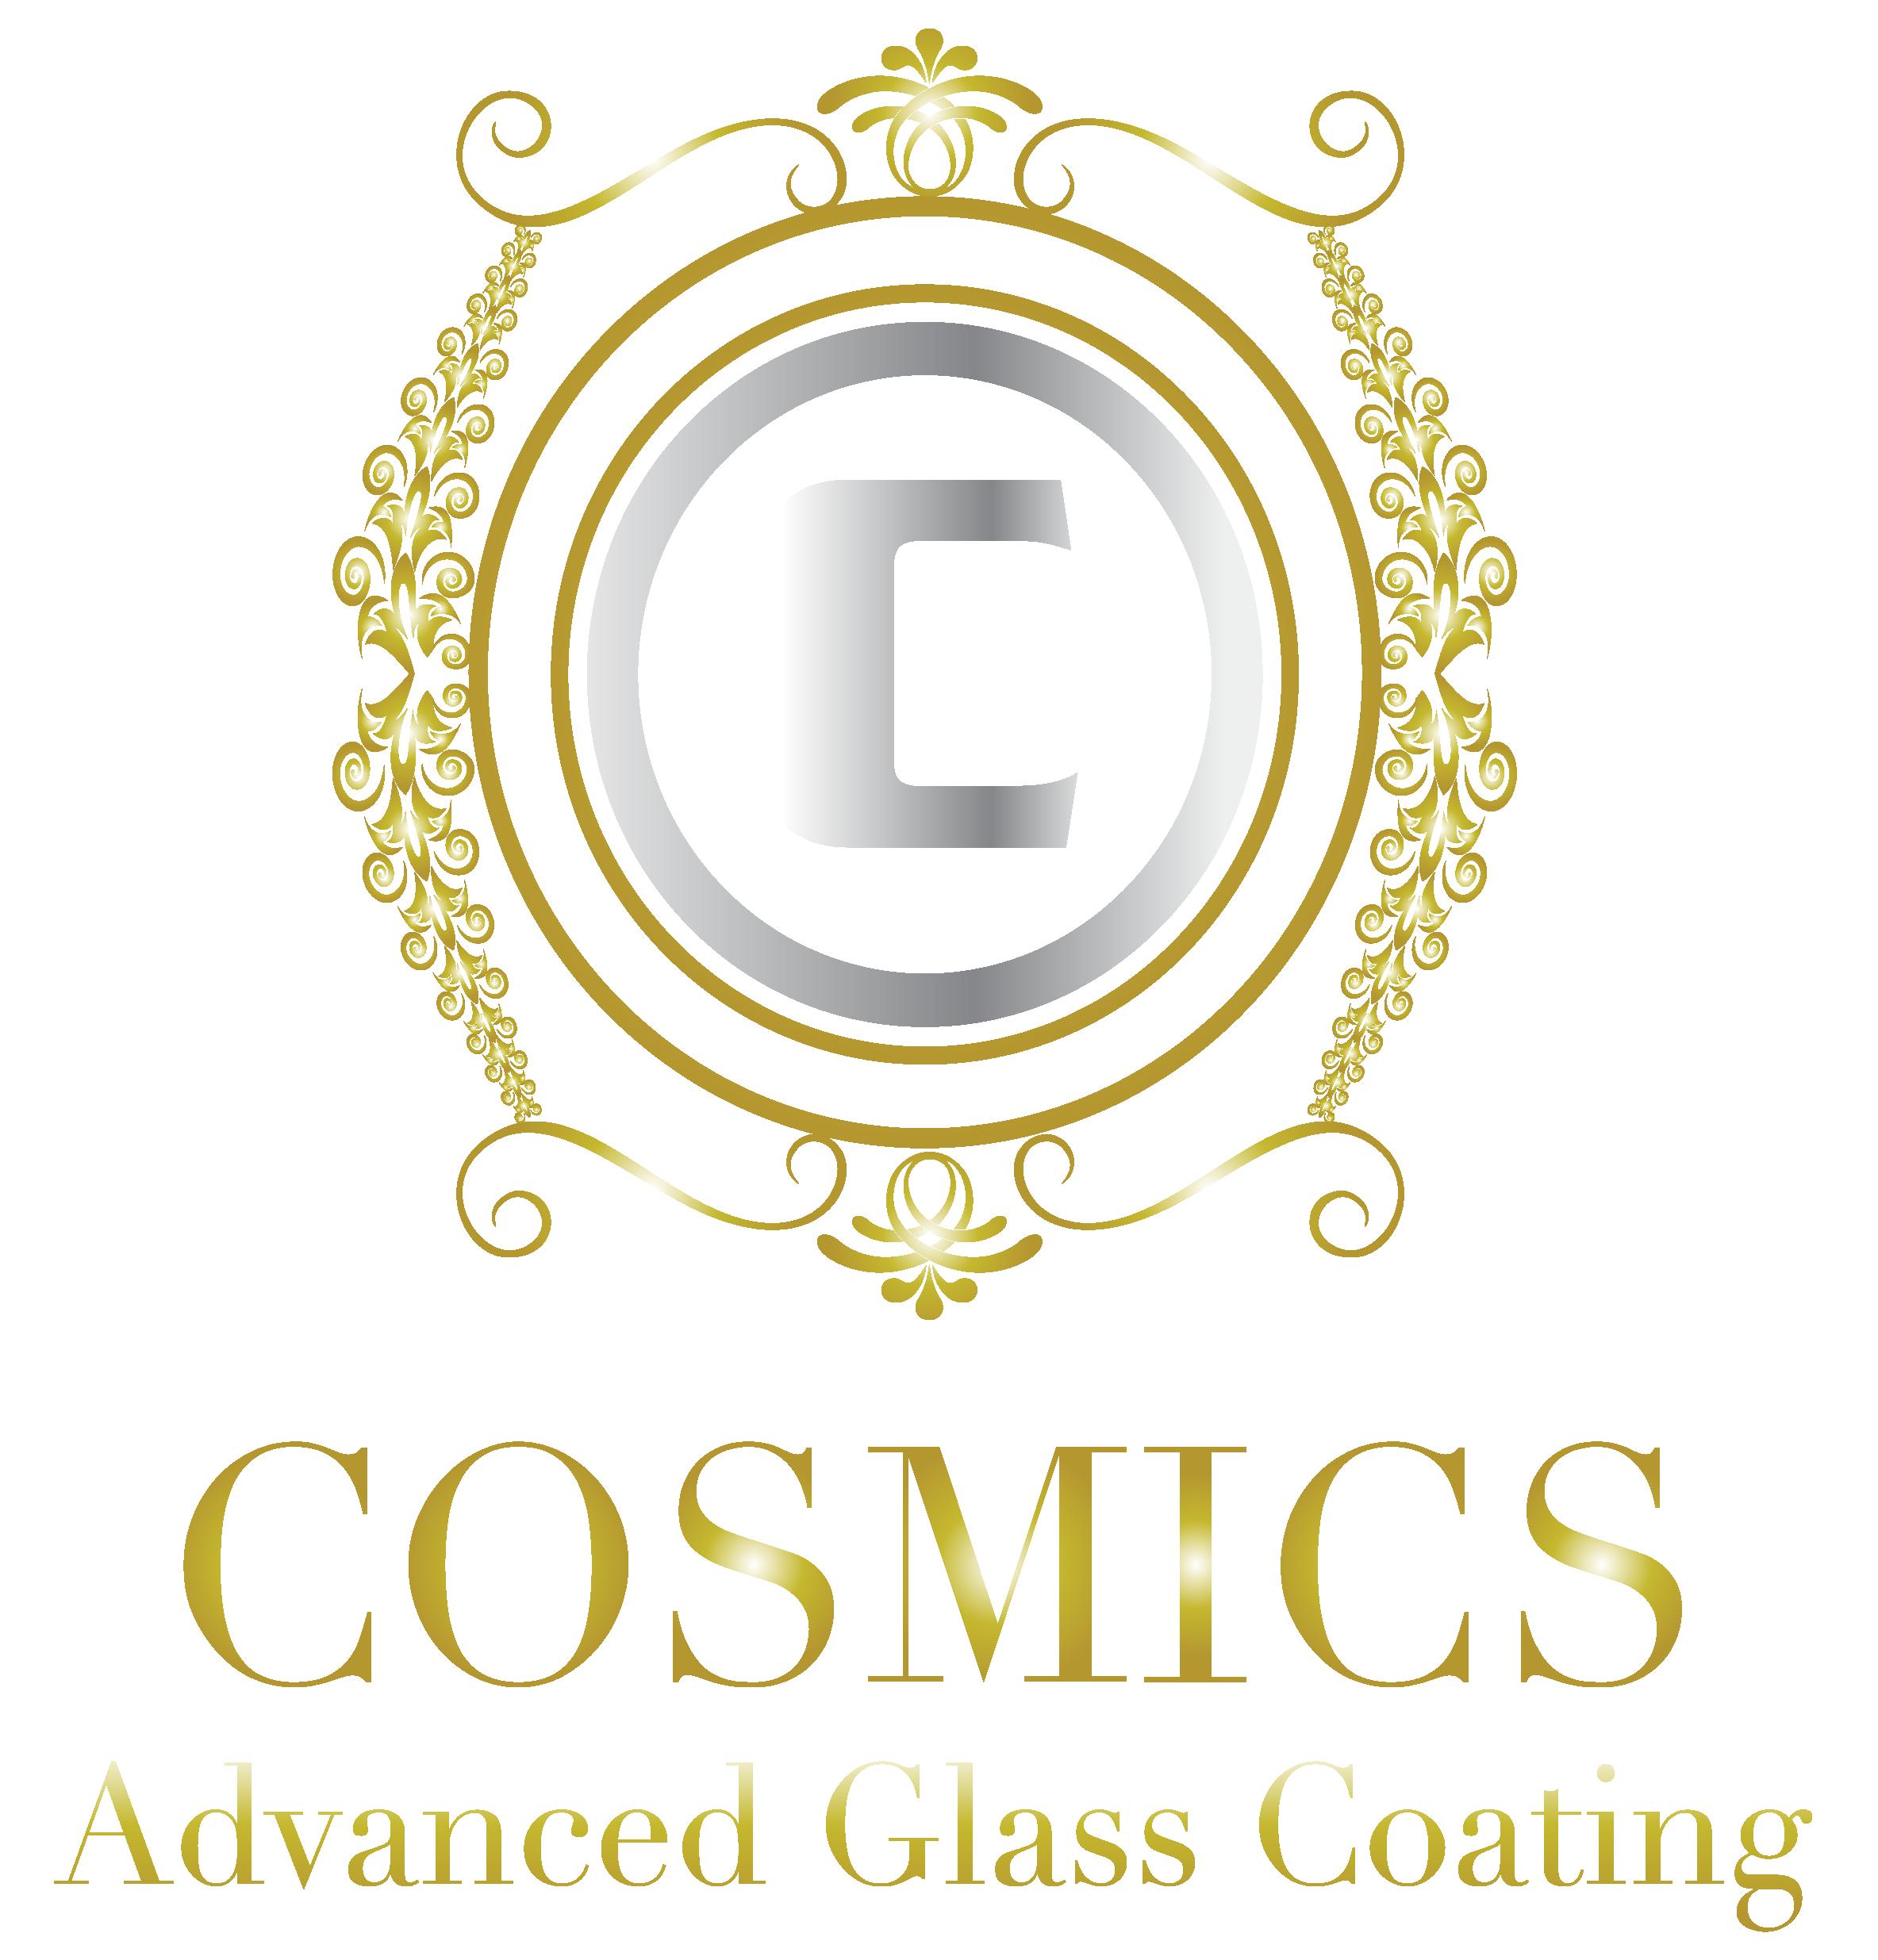 cosmics logo